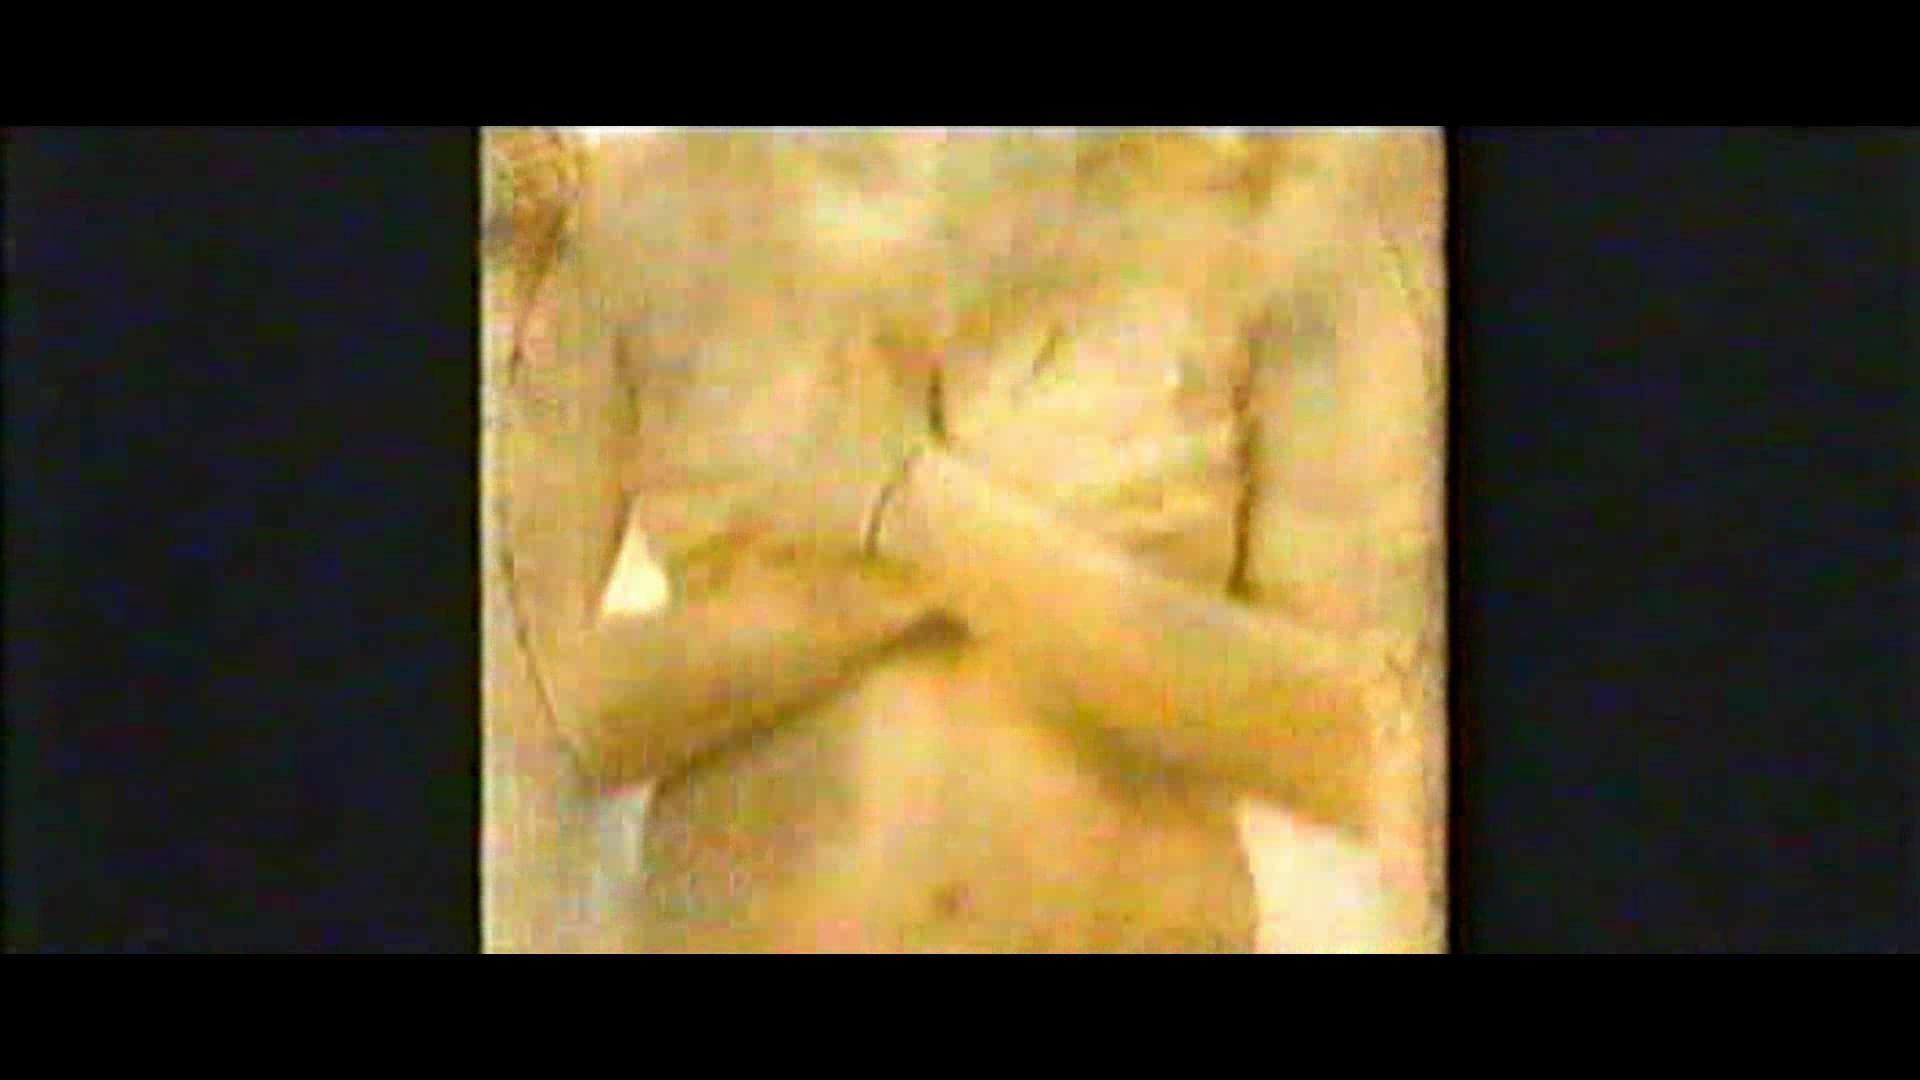 Brooke Long Nude brooke long - nude (lq) - rose and alexander - #1